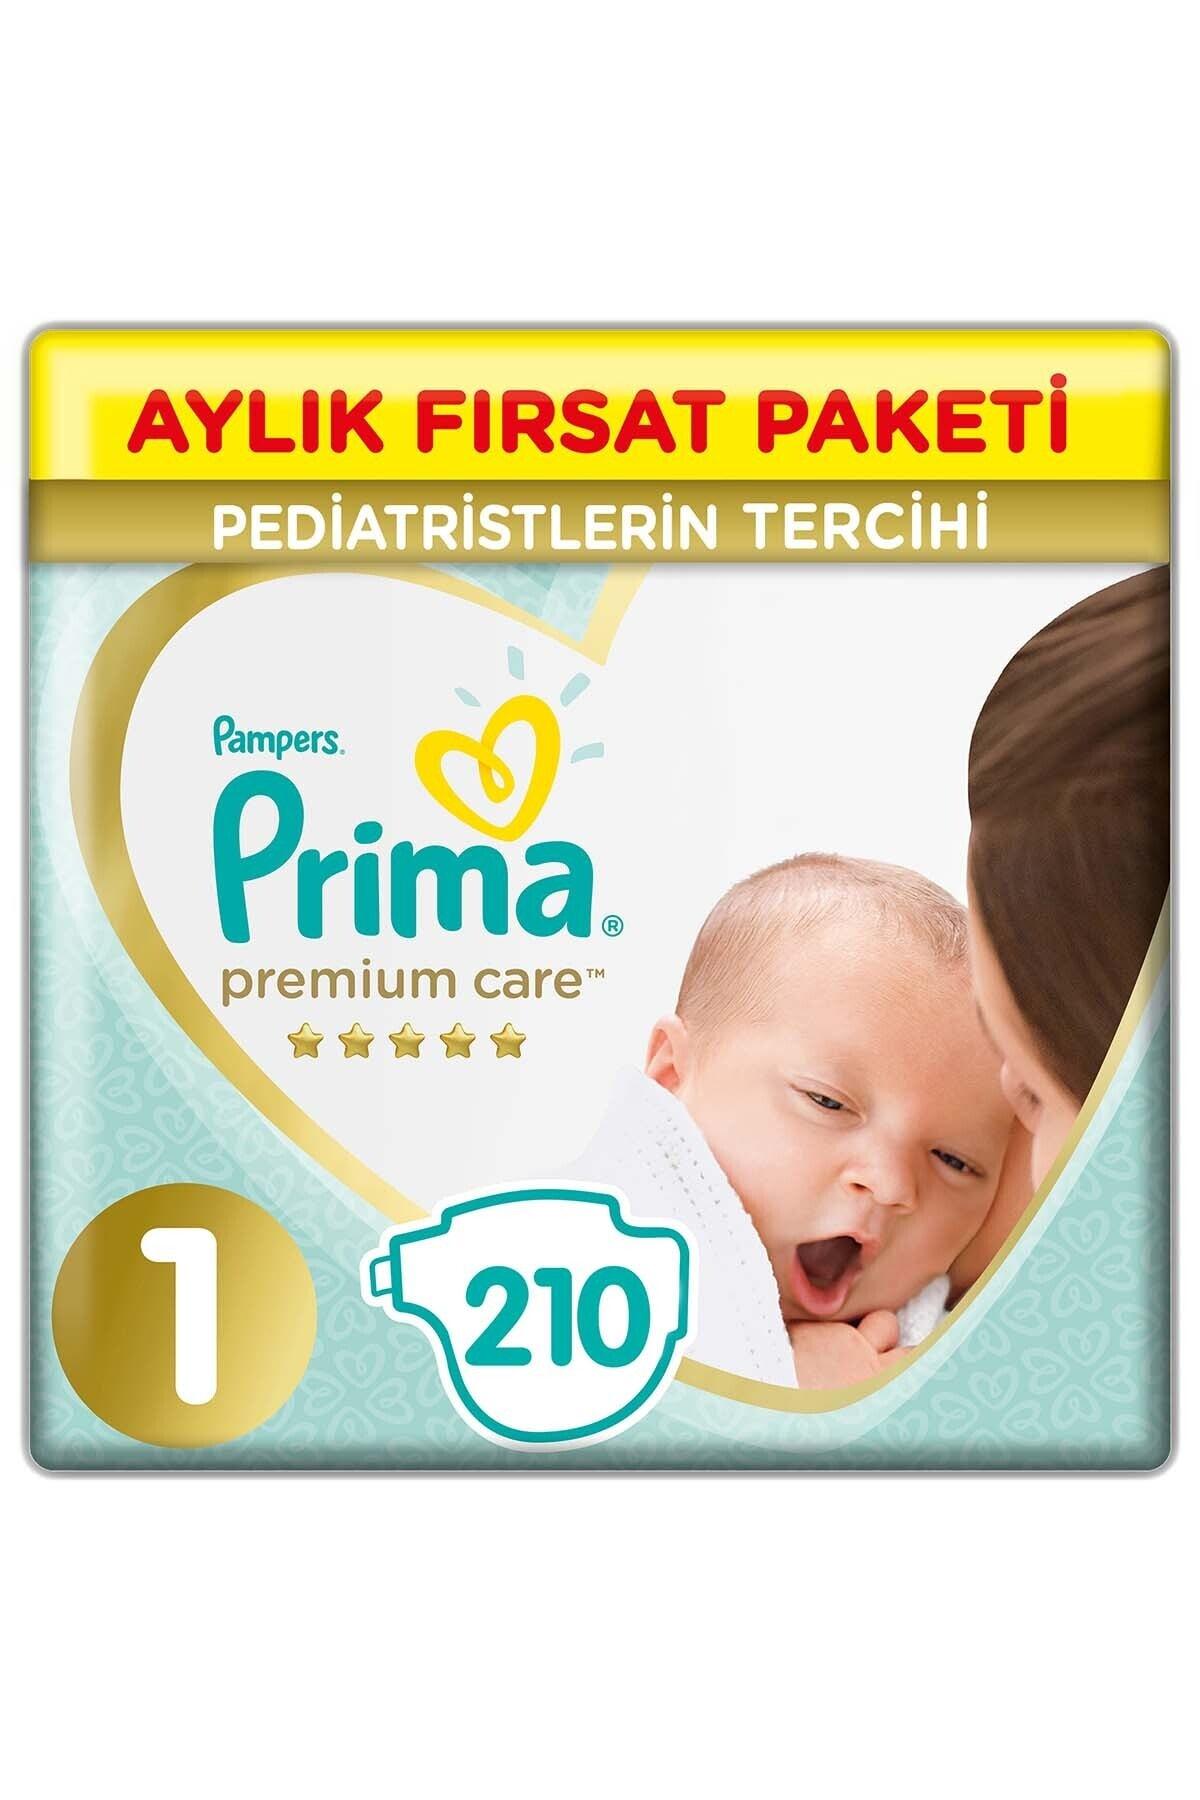 Prima Bebek Bezi Premium Care 1 Beden 210 Adet Aylık Fırsat Paketi 1